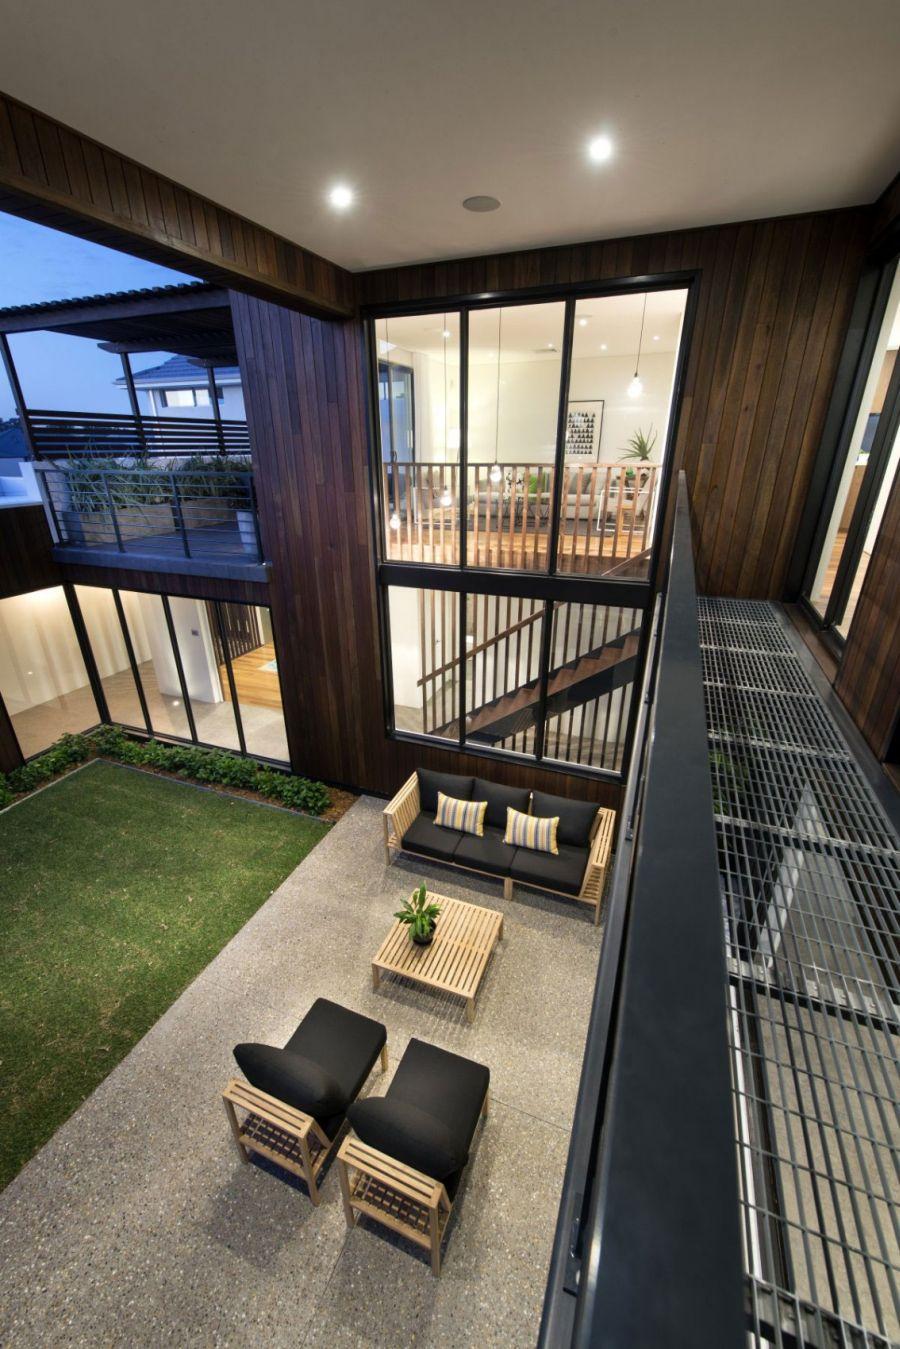 Ravishing Perth Residence Sports Sleek Design And A